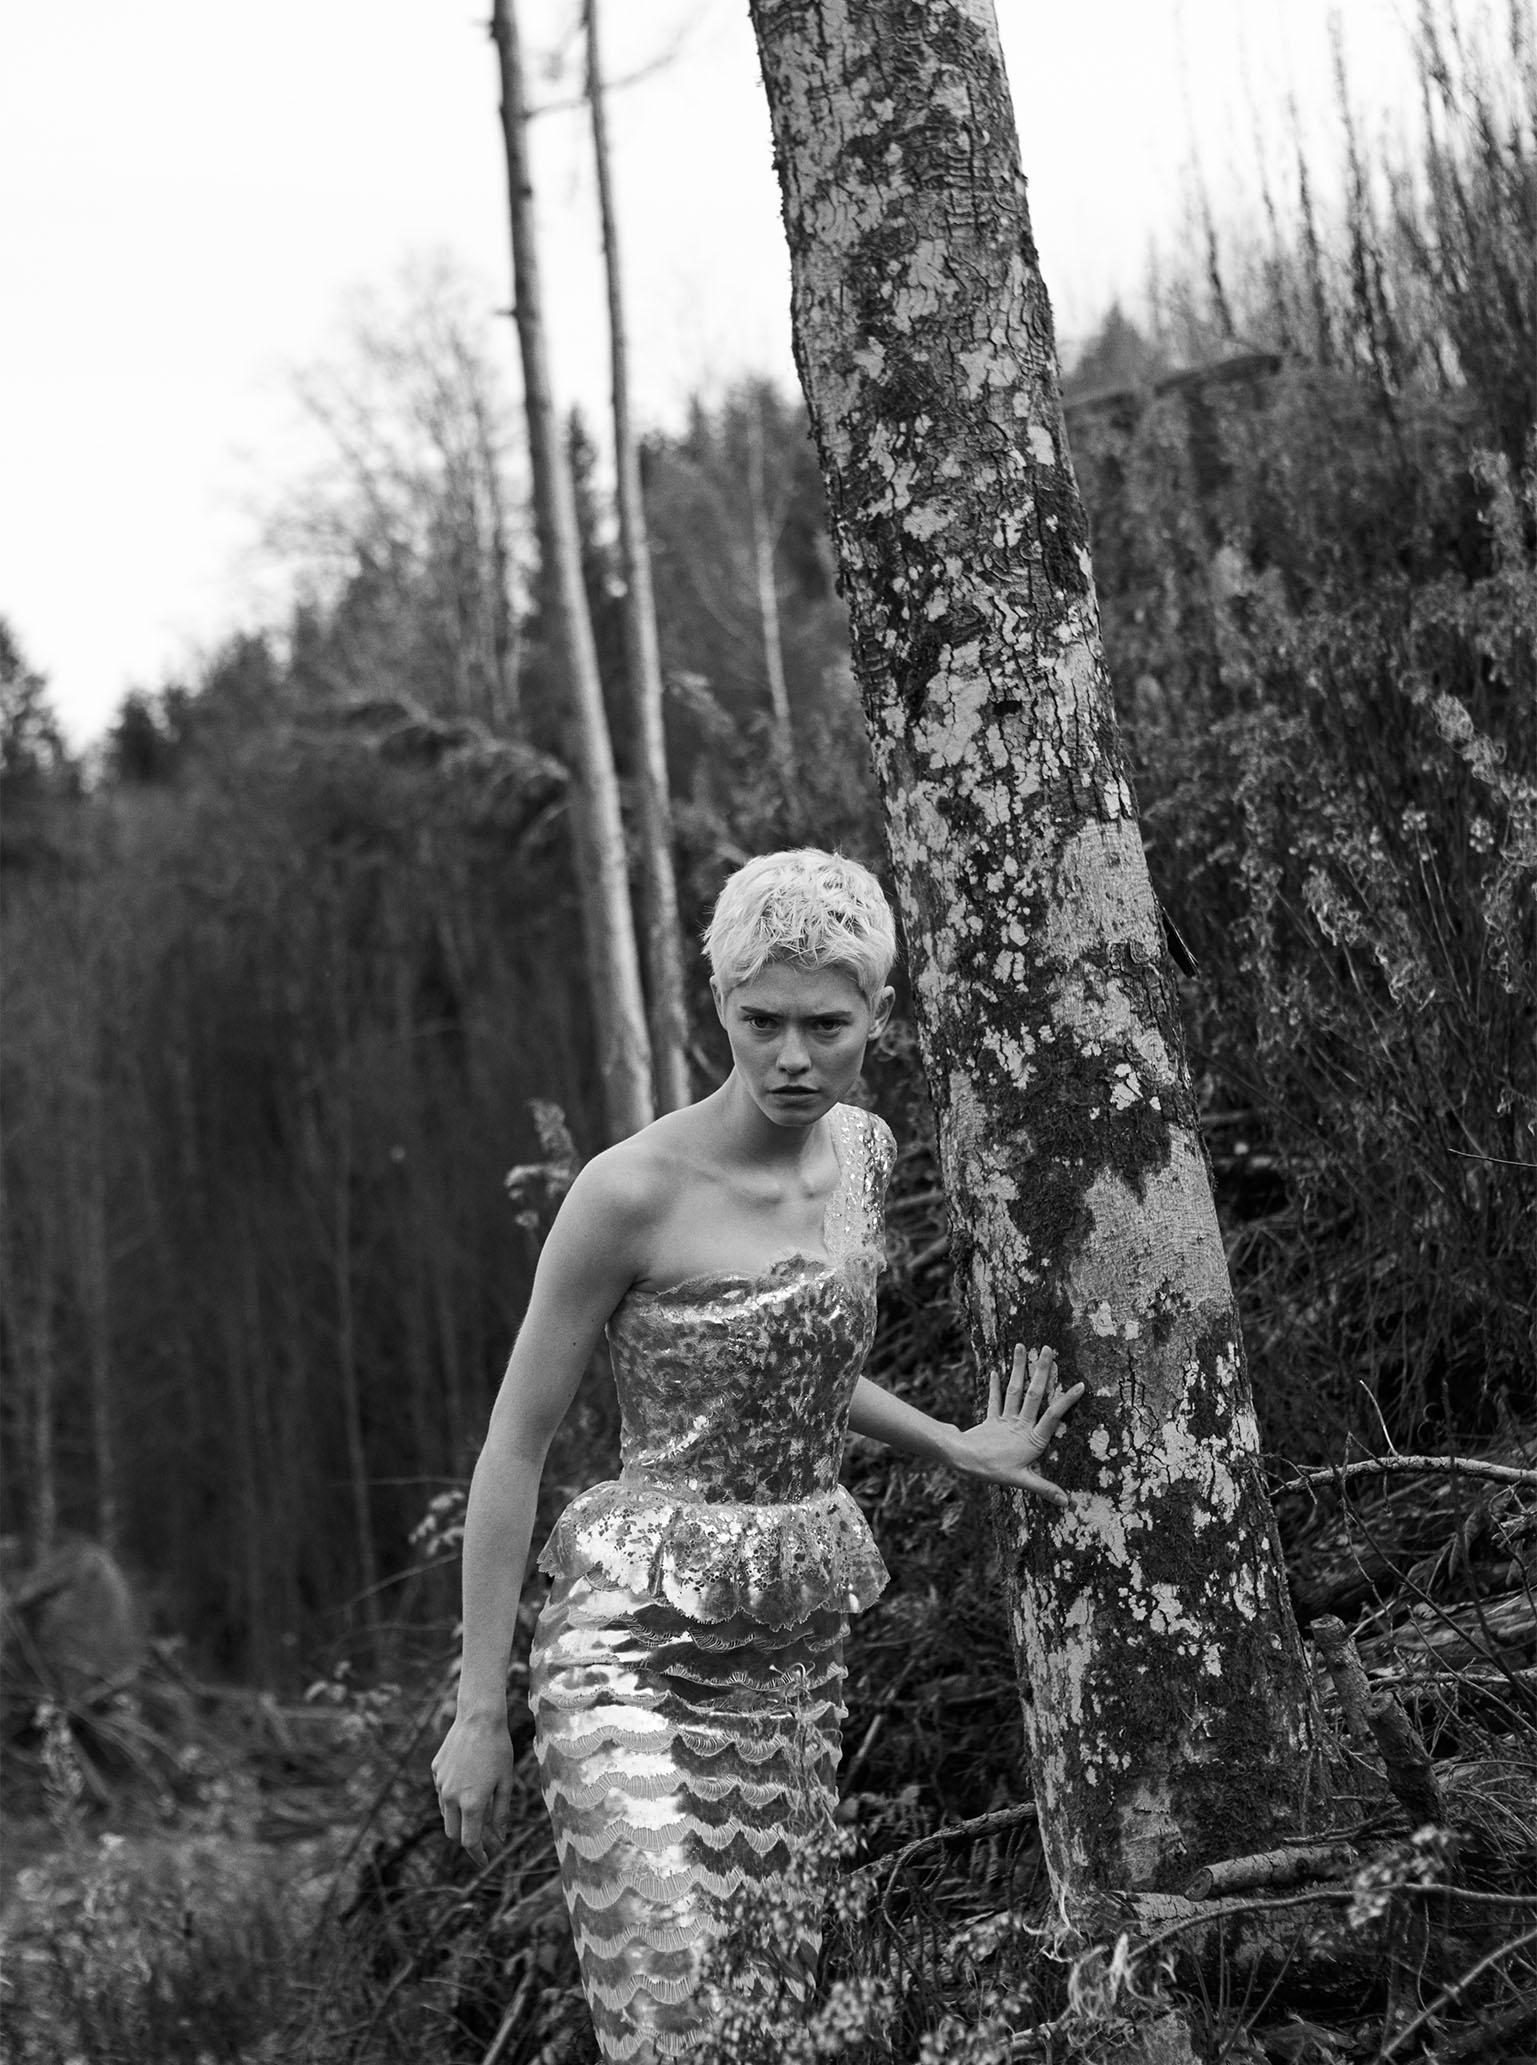 Chanel Haute Couture dress Maike Inga im Schwarzwald